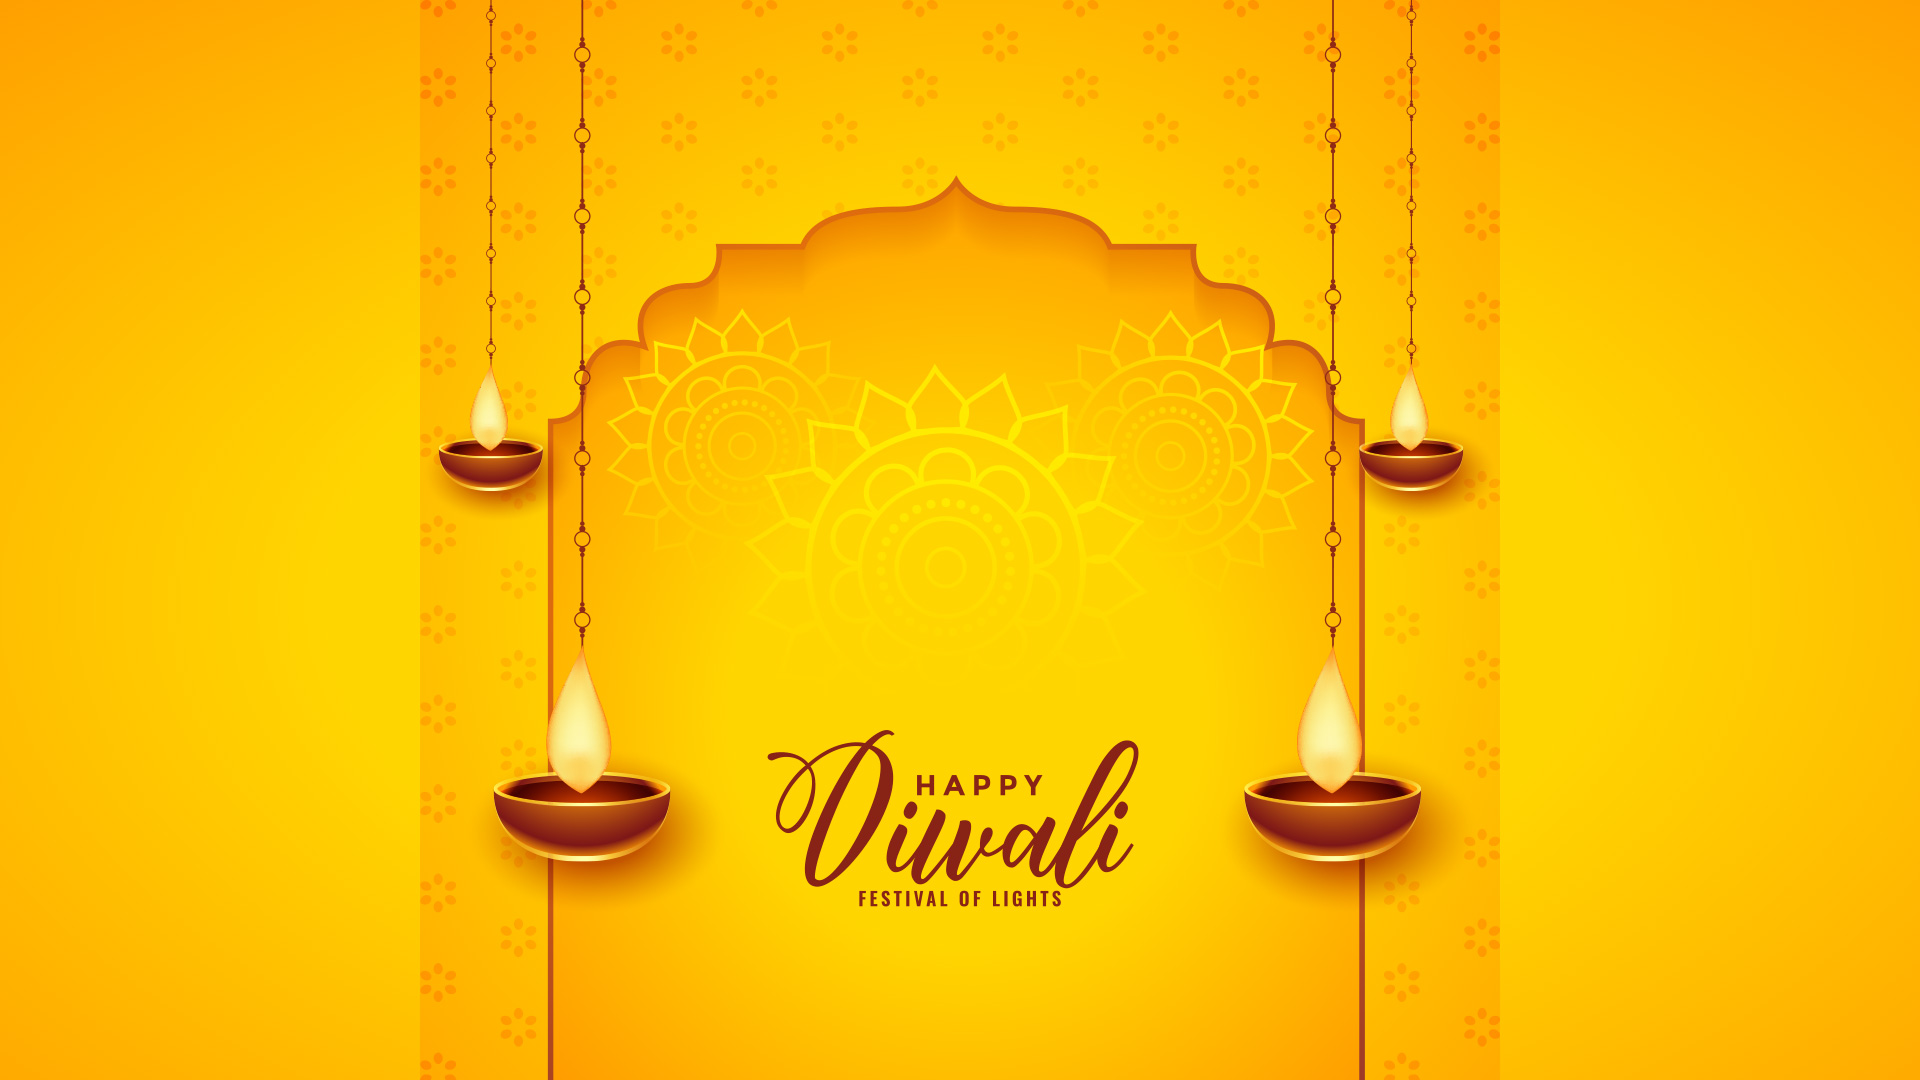 Day 4 Diwali 16 9